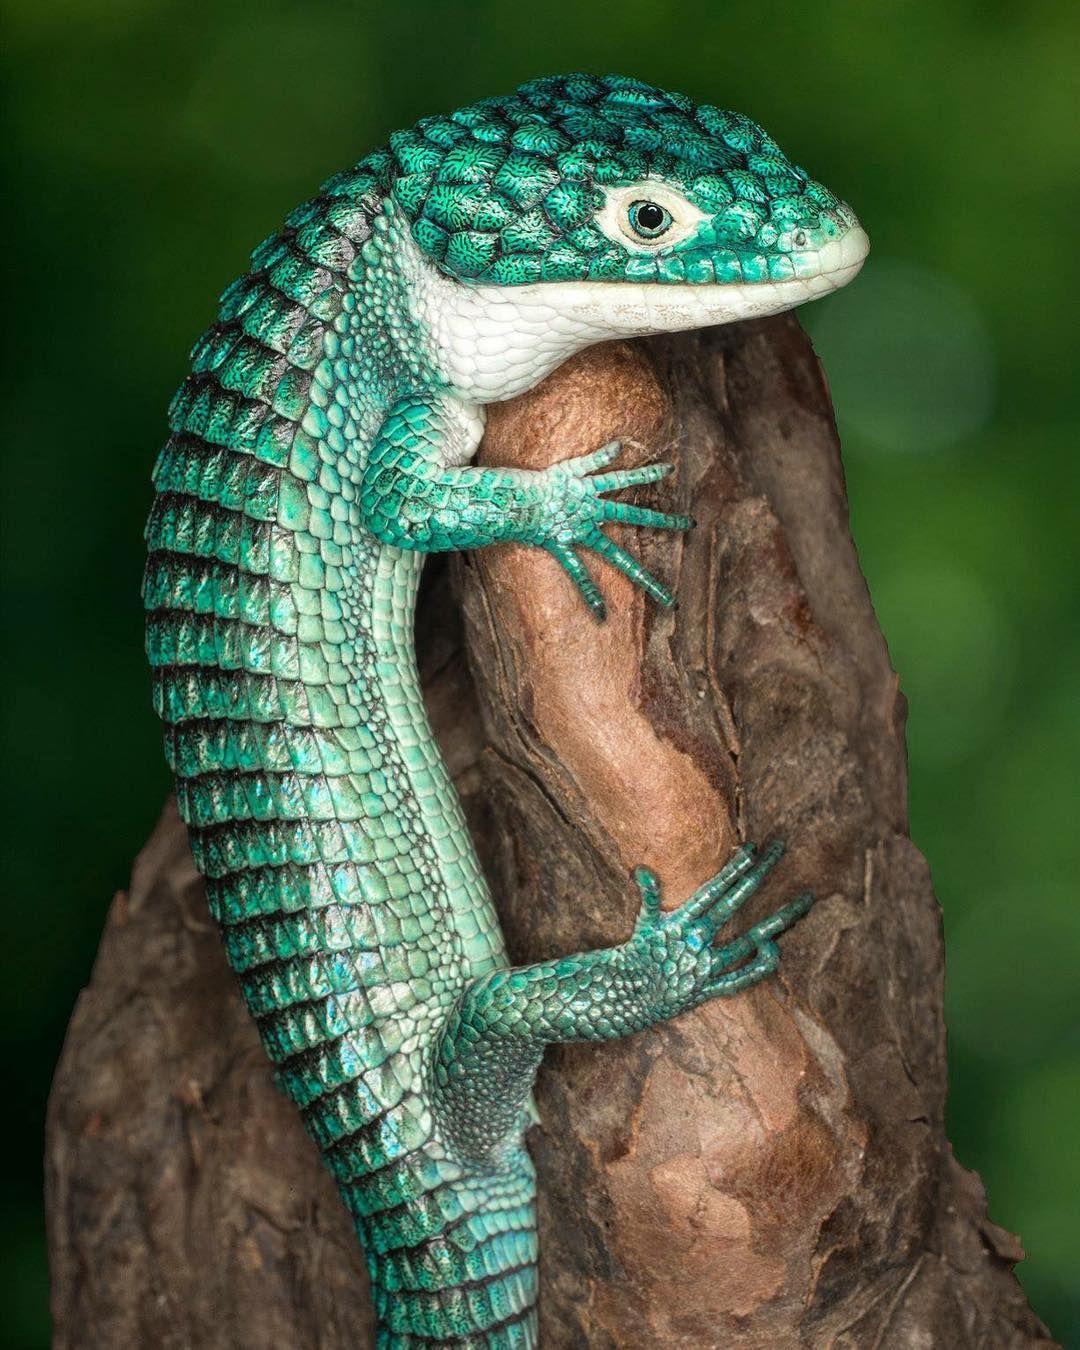 The very photogenic mexican alligator lizardhttps//i